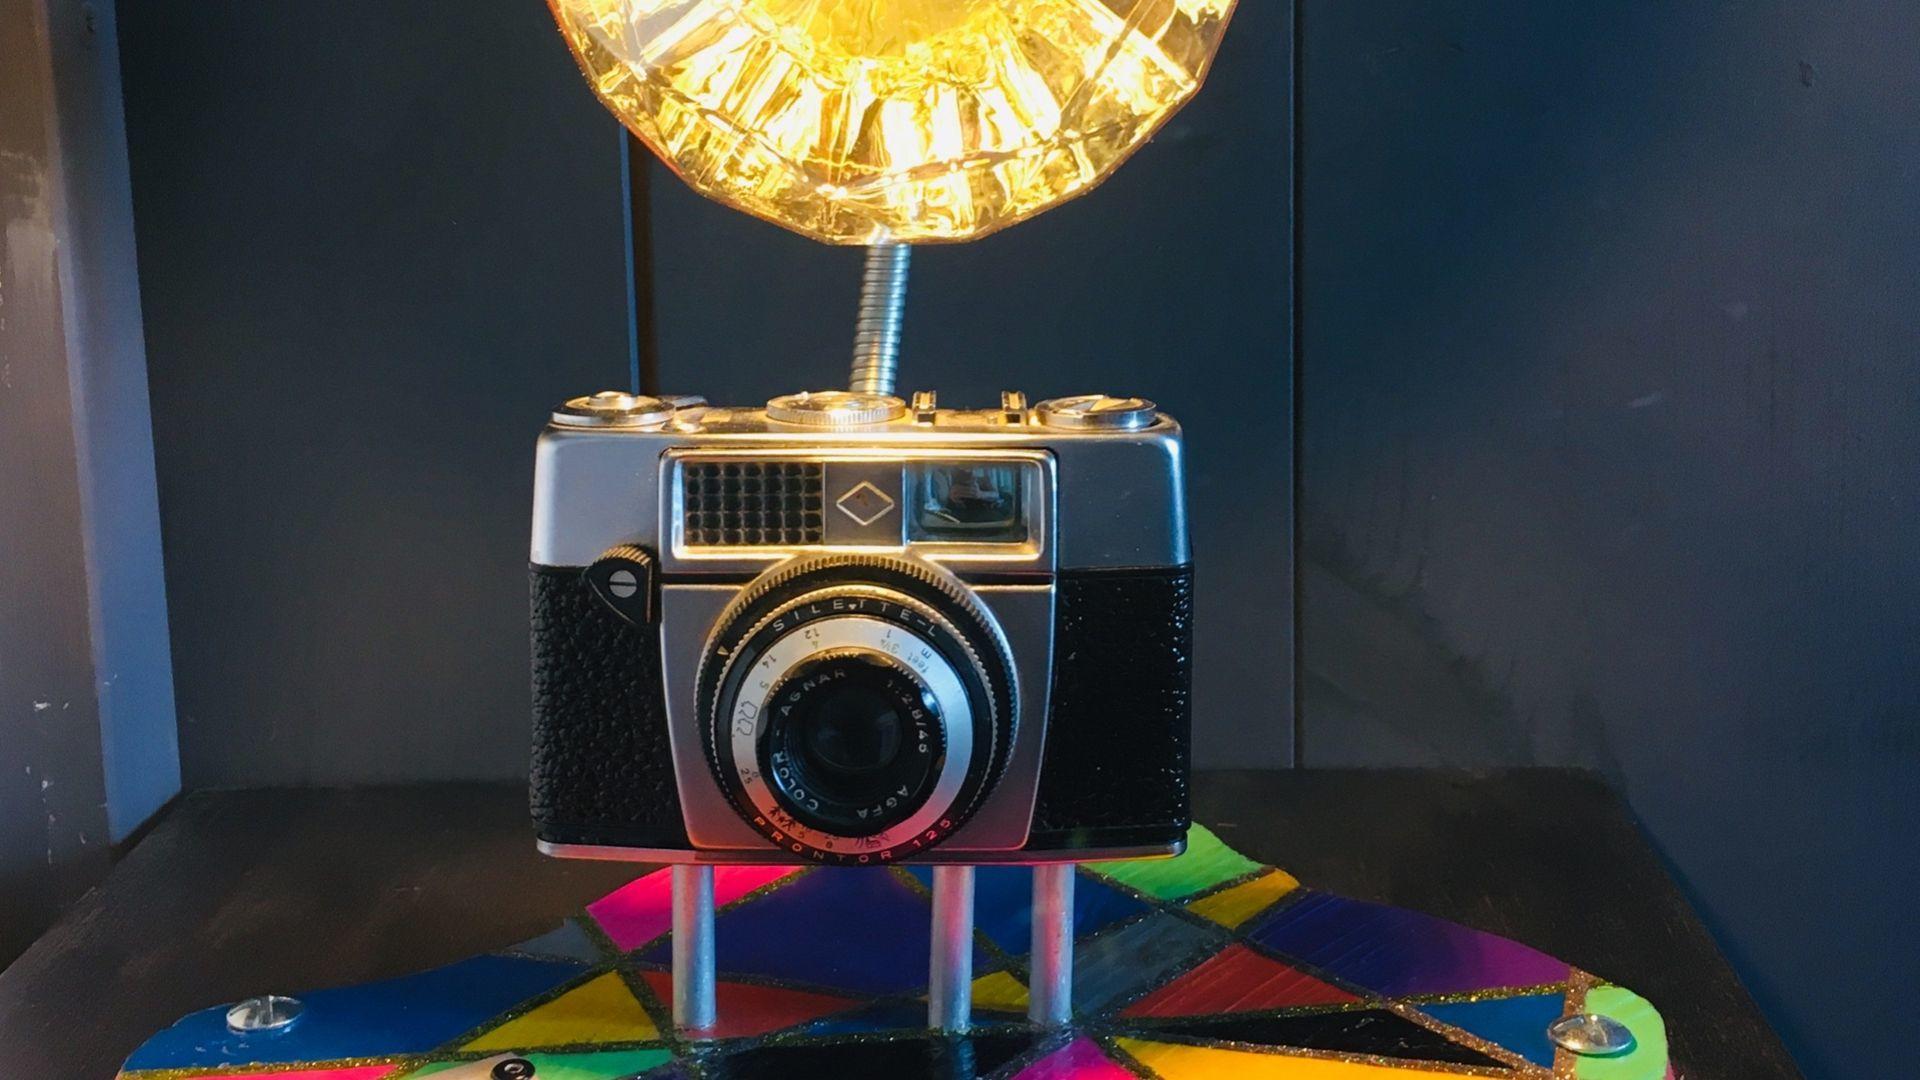 Les luminaires de Mura Fowski